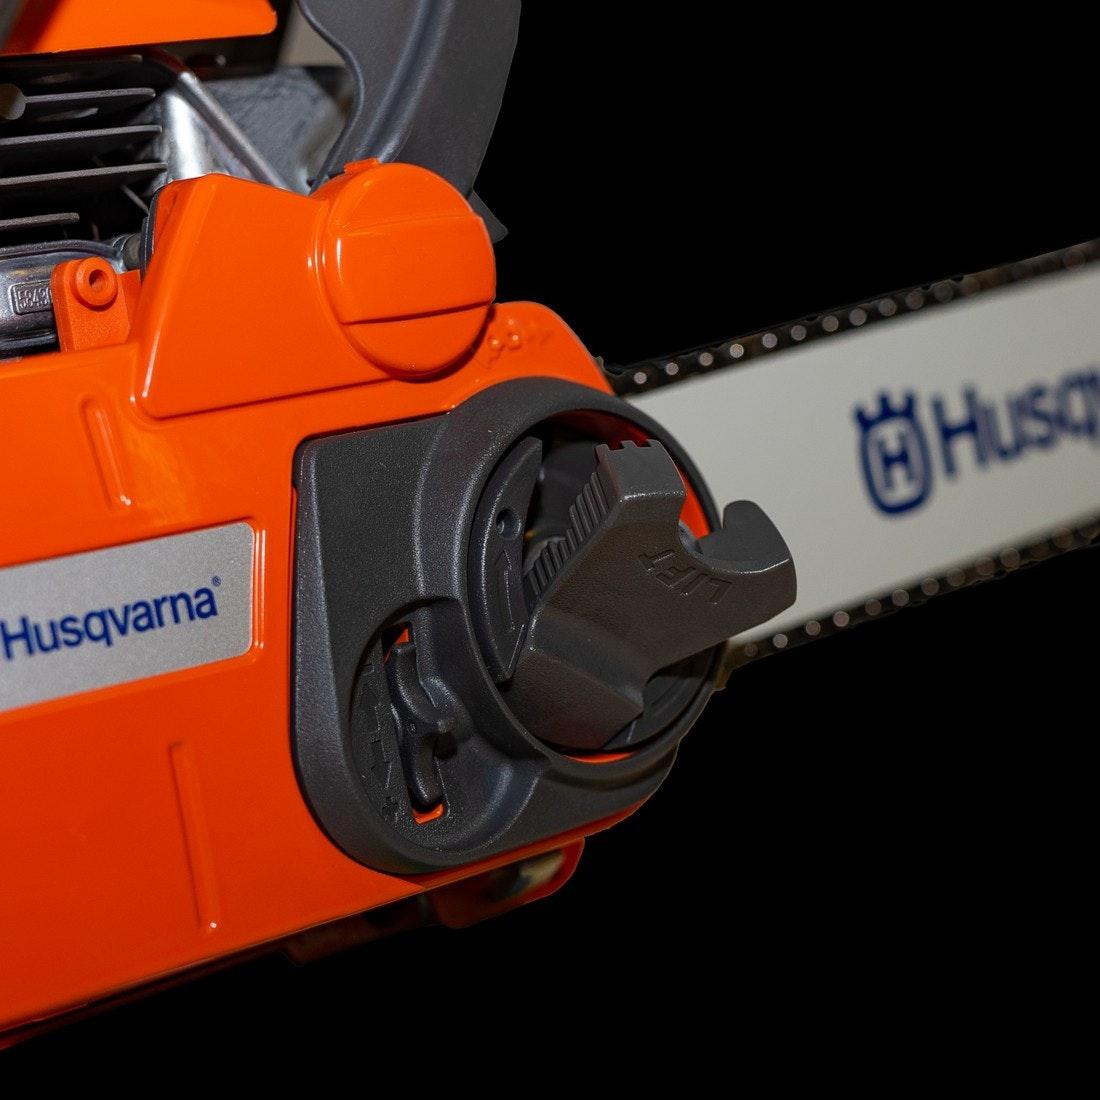 Husqvarna 135e Werkzeugloser Kettenspanner